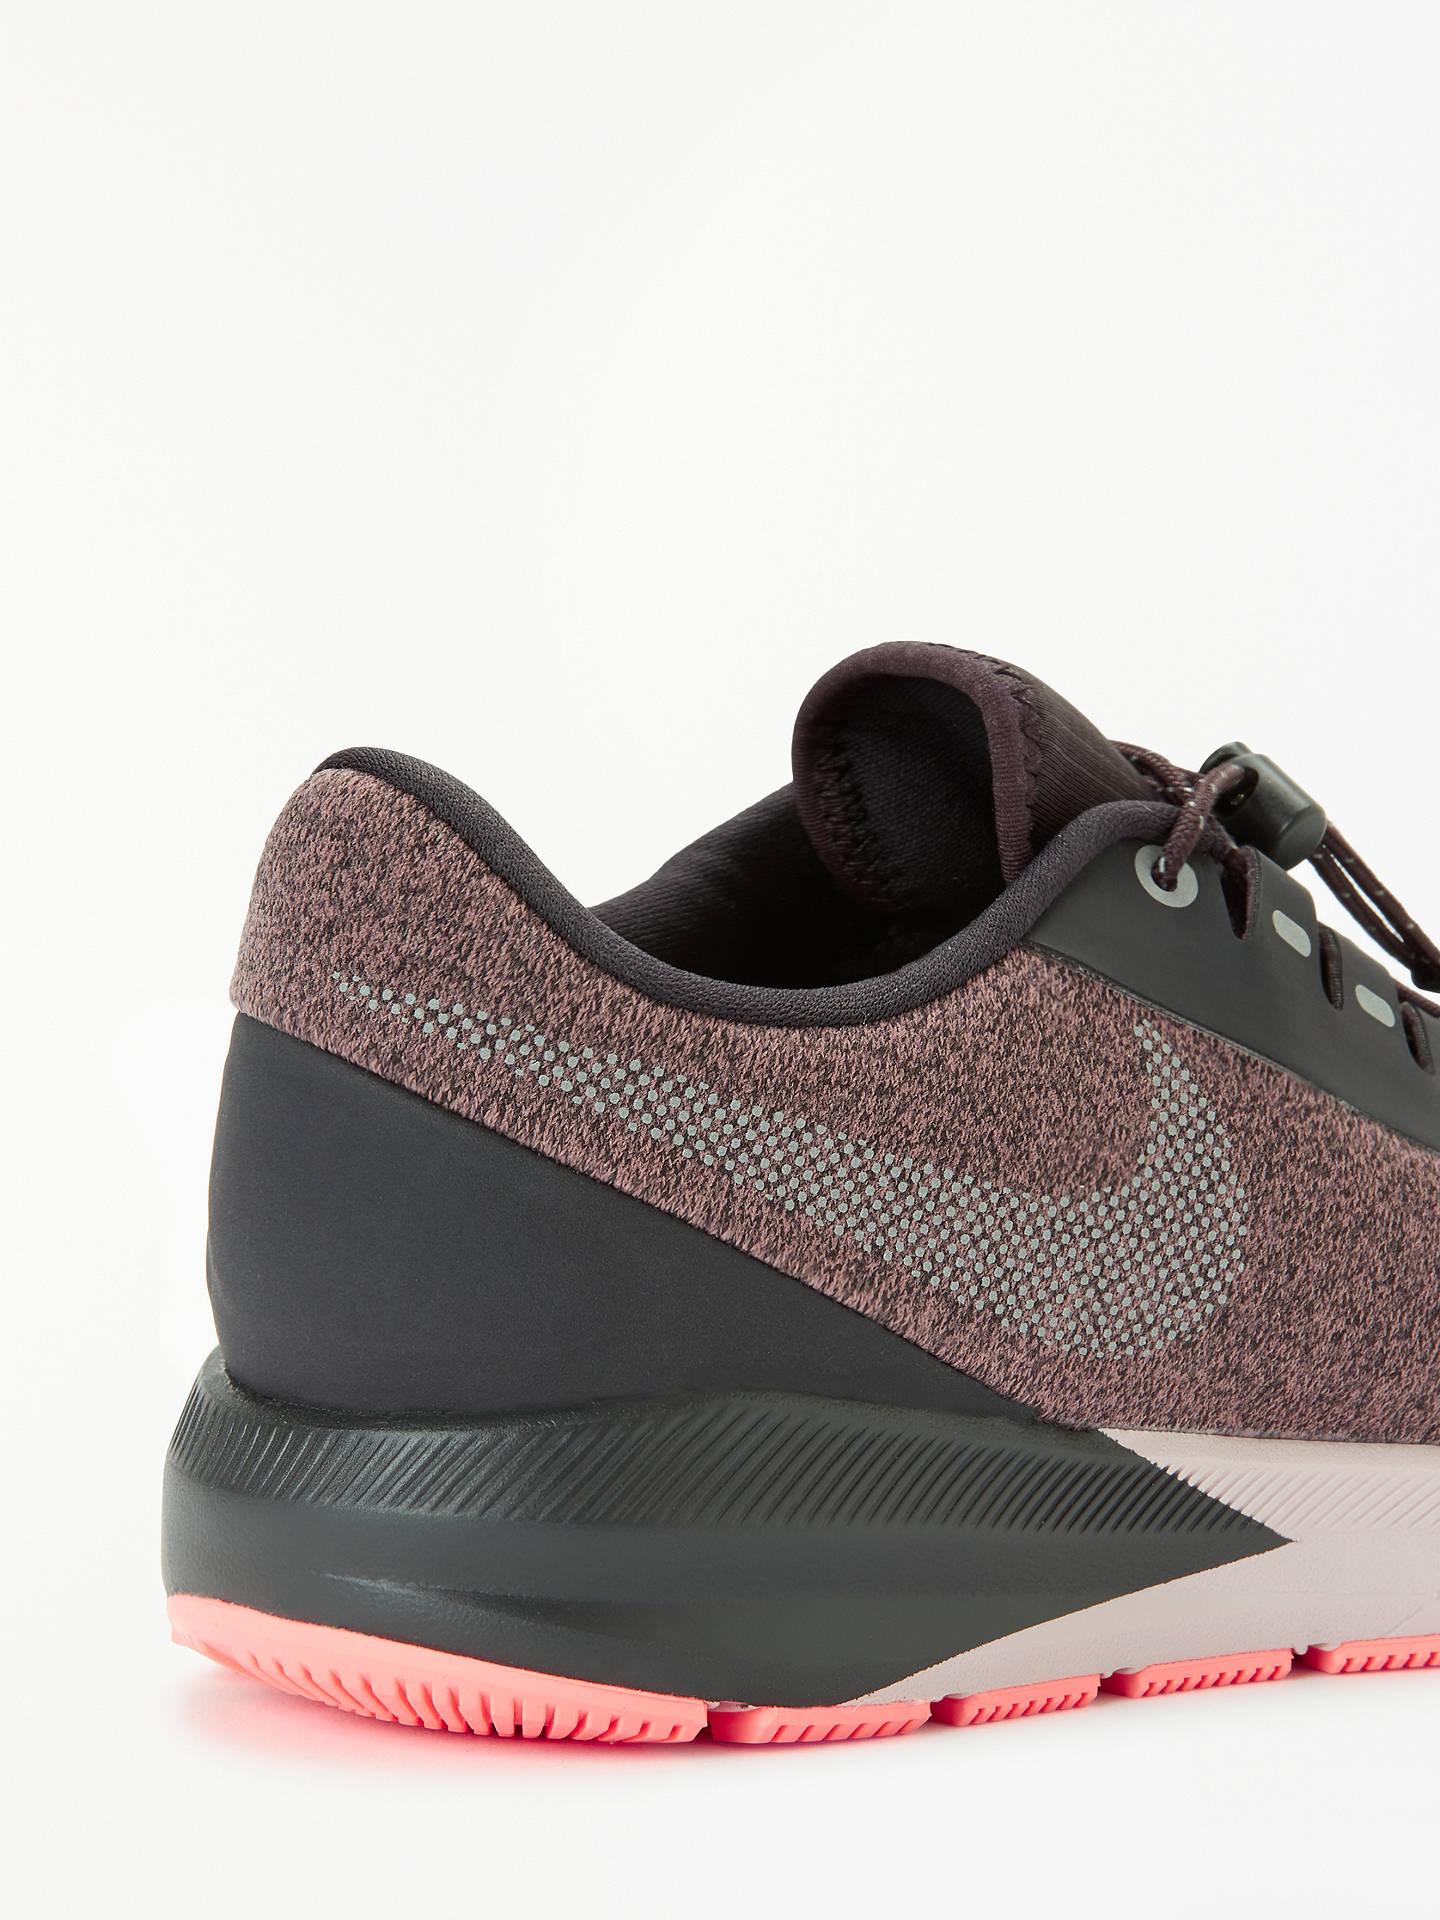 7b0732c7c9f1 ... Buy Nike Air Zoom Structure 22 Shield Women s Running Shoes